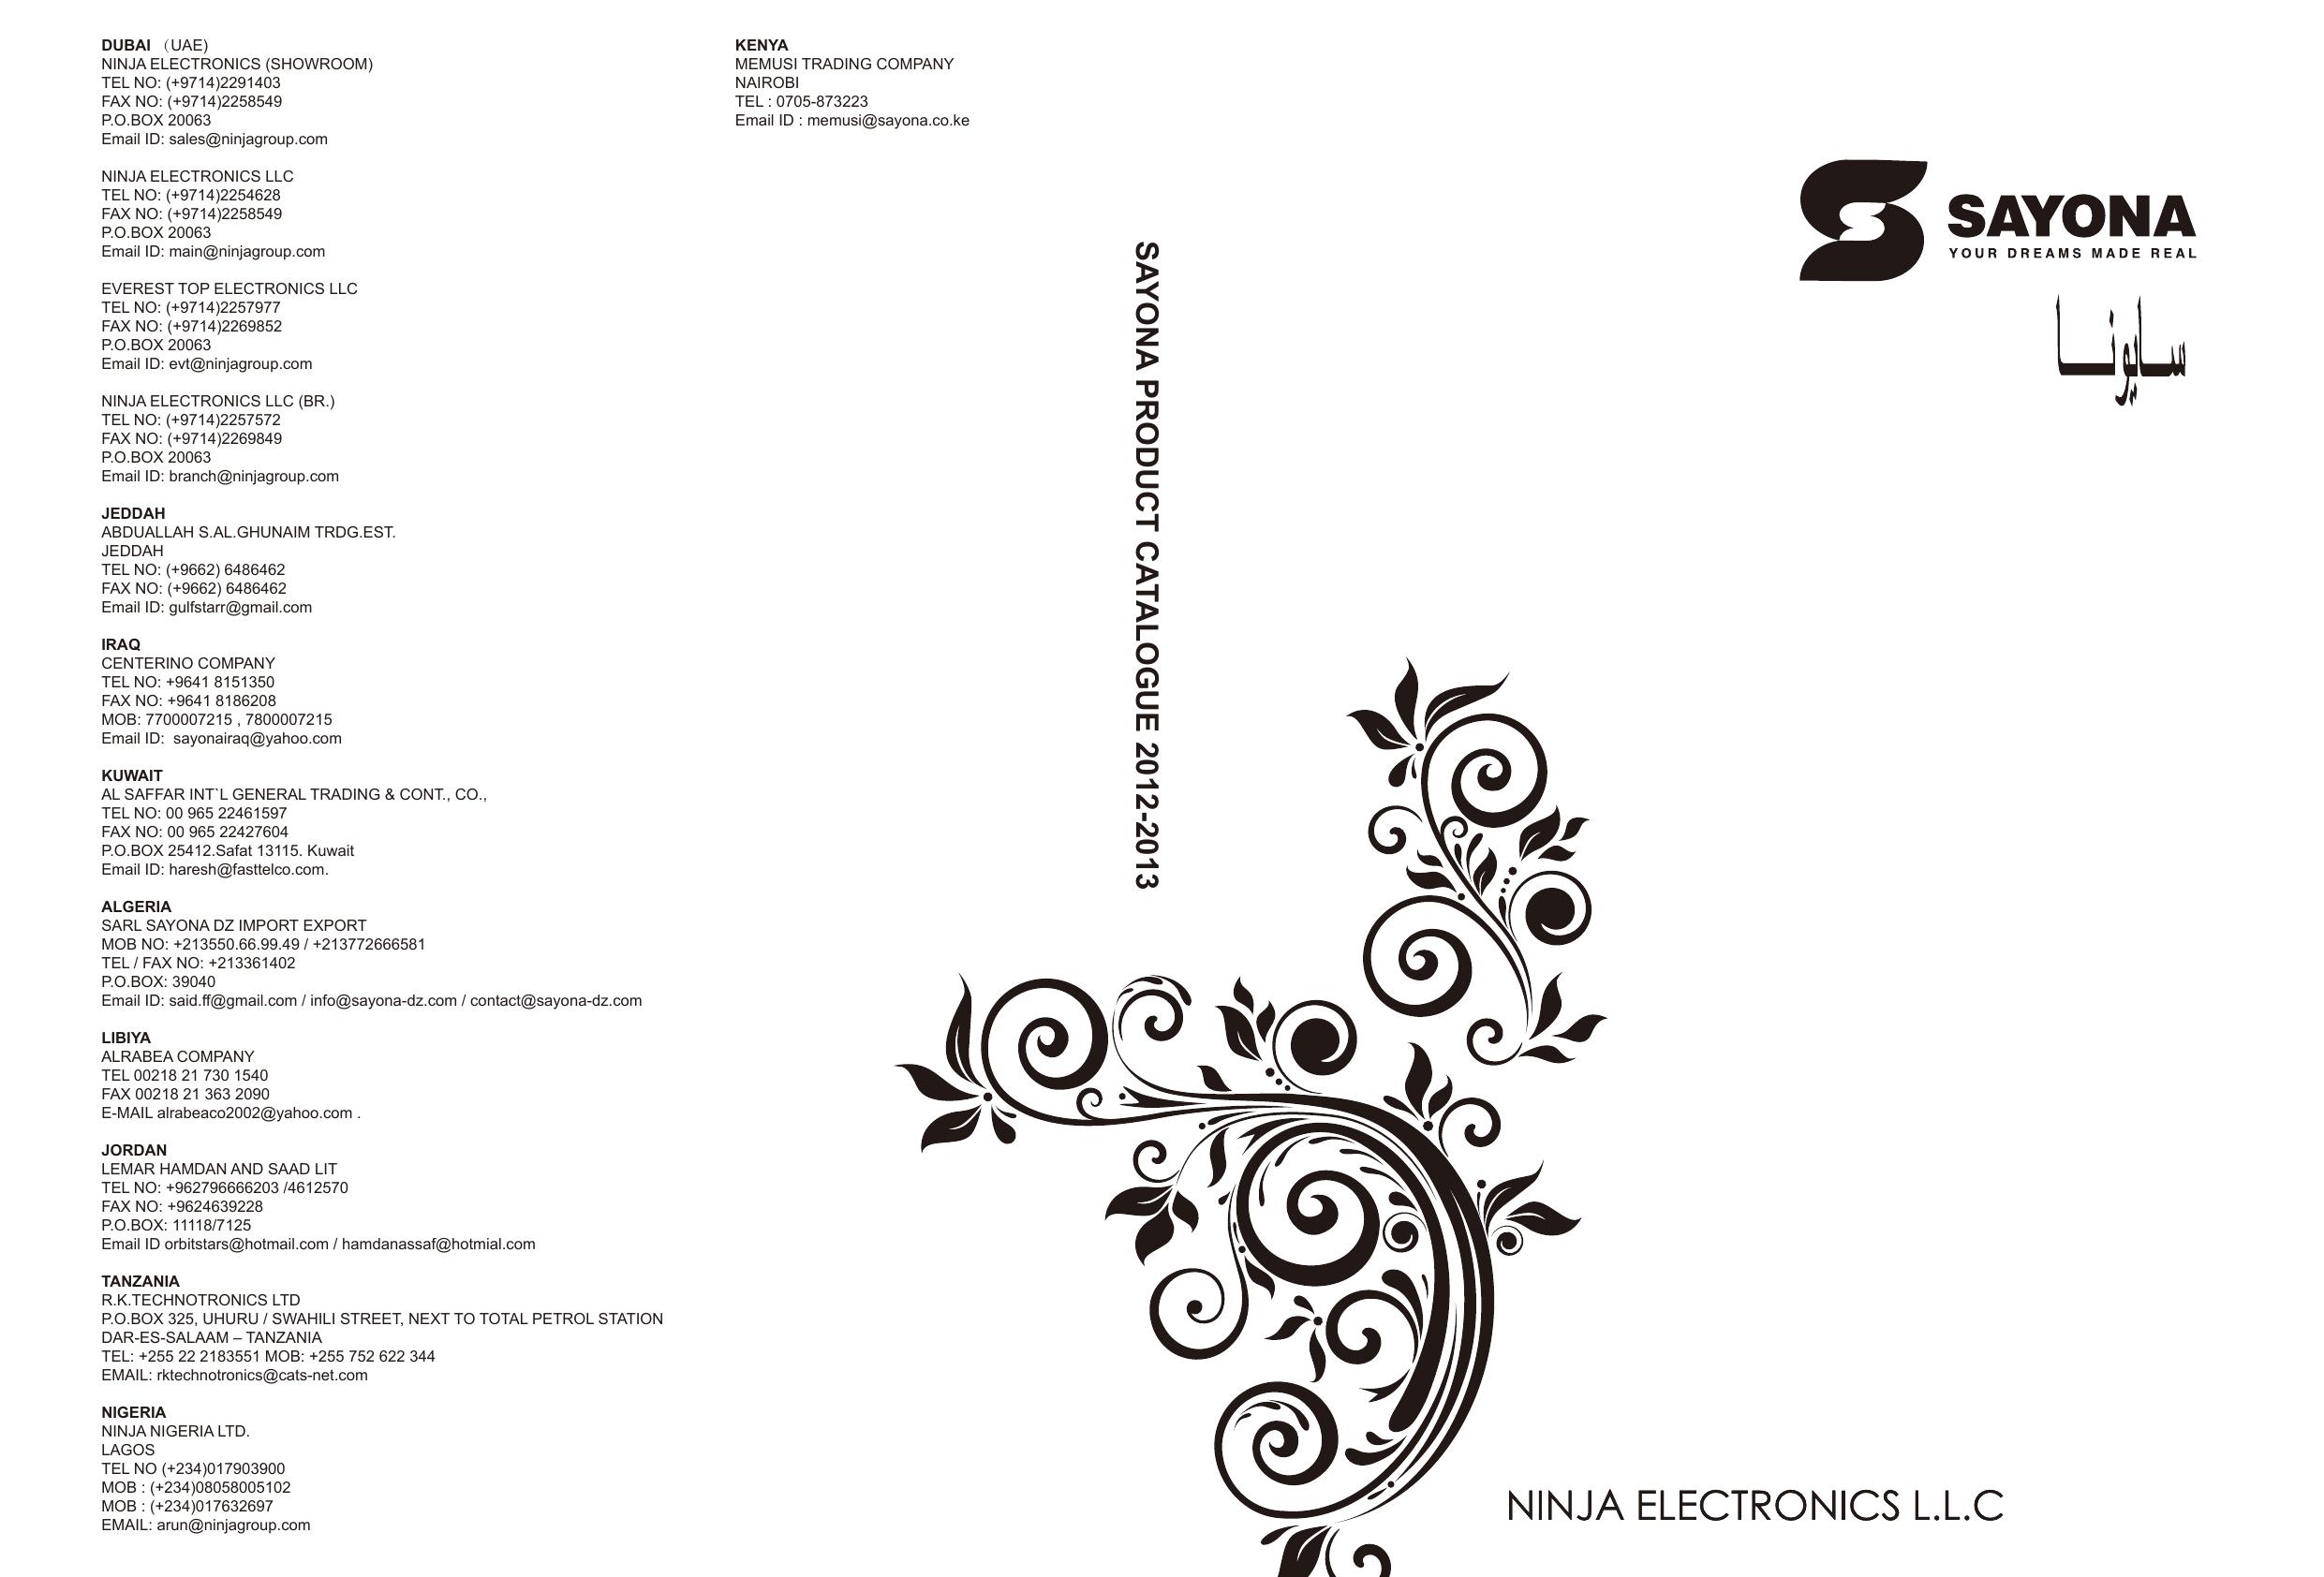 wp-content/uploads/Sayona Home Theatre Systems | manualzz com